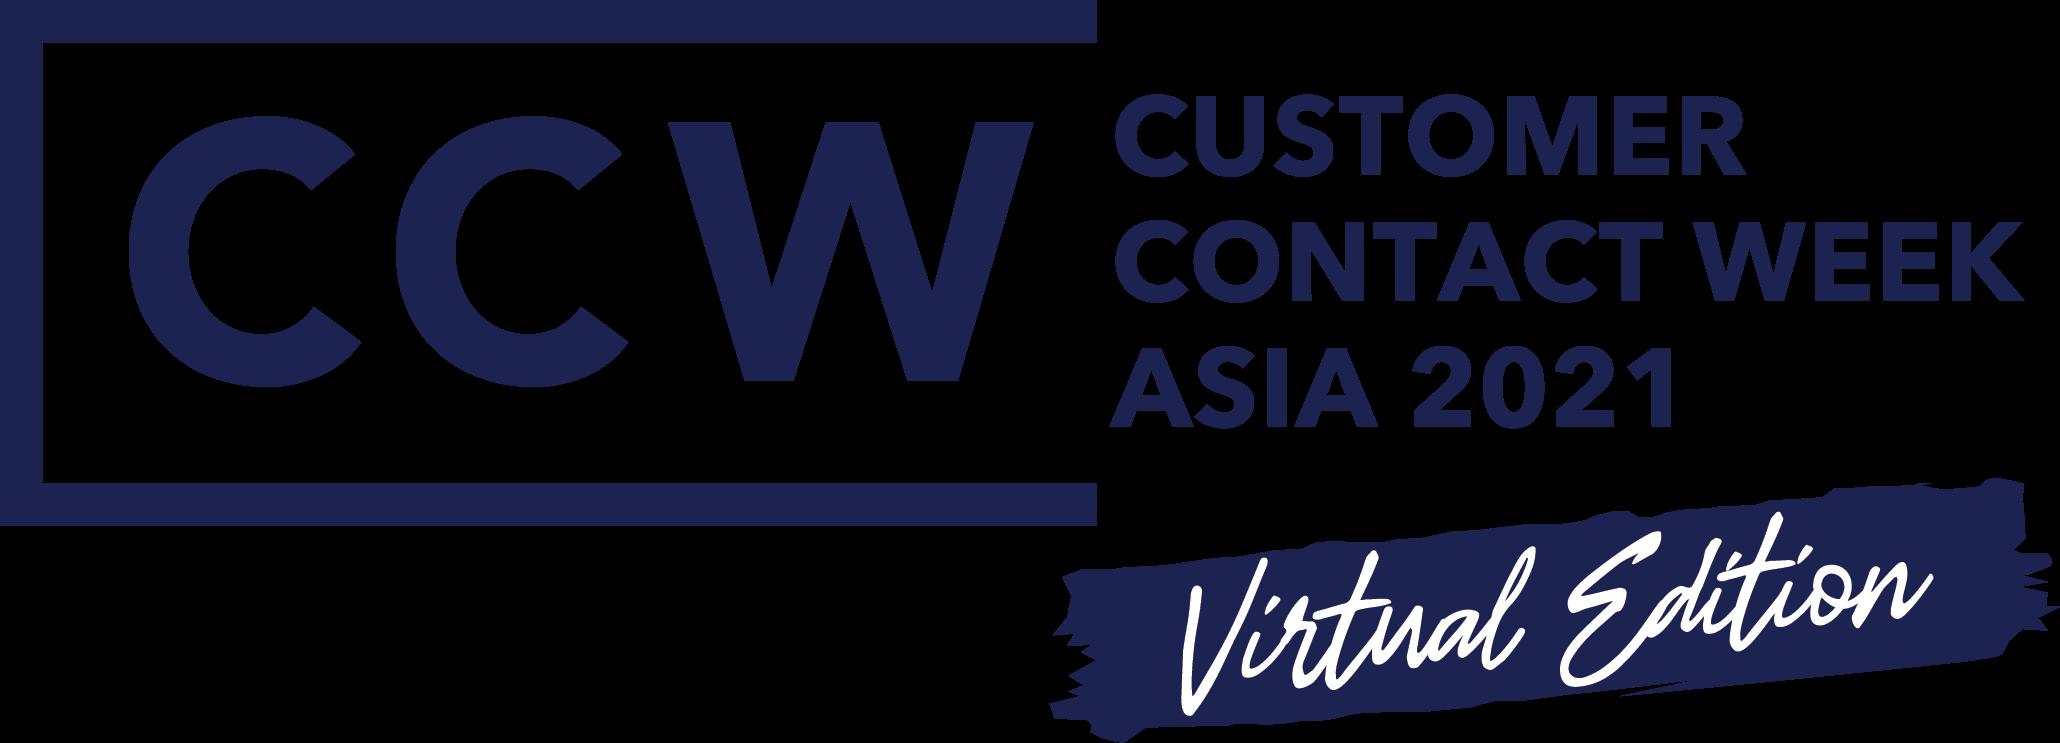 Customer Contact Week Asia 2021 – Virtual Edition